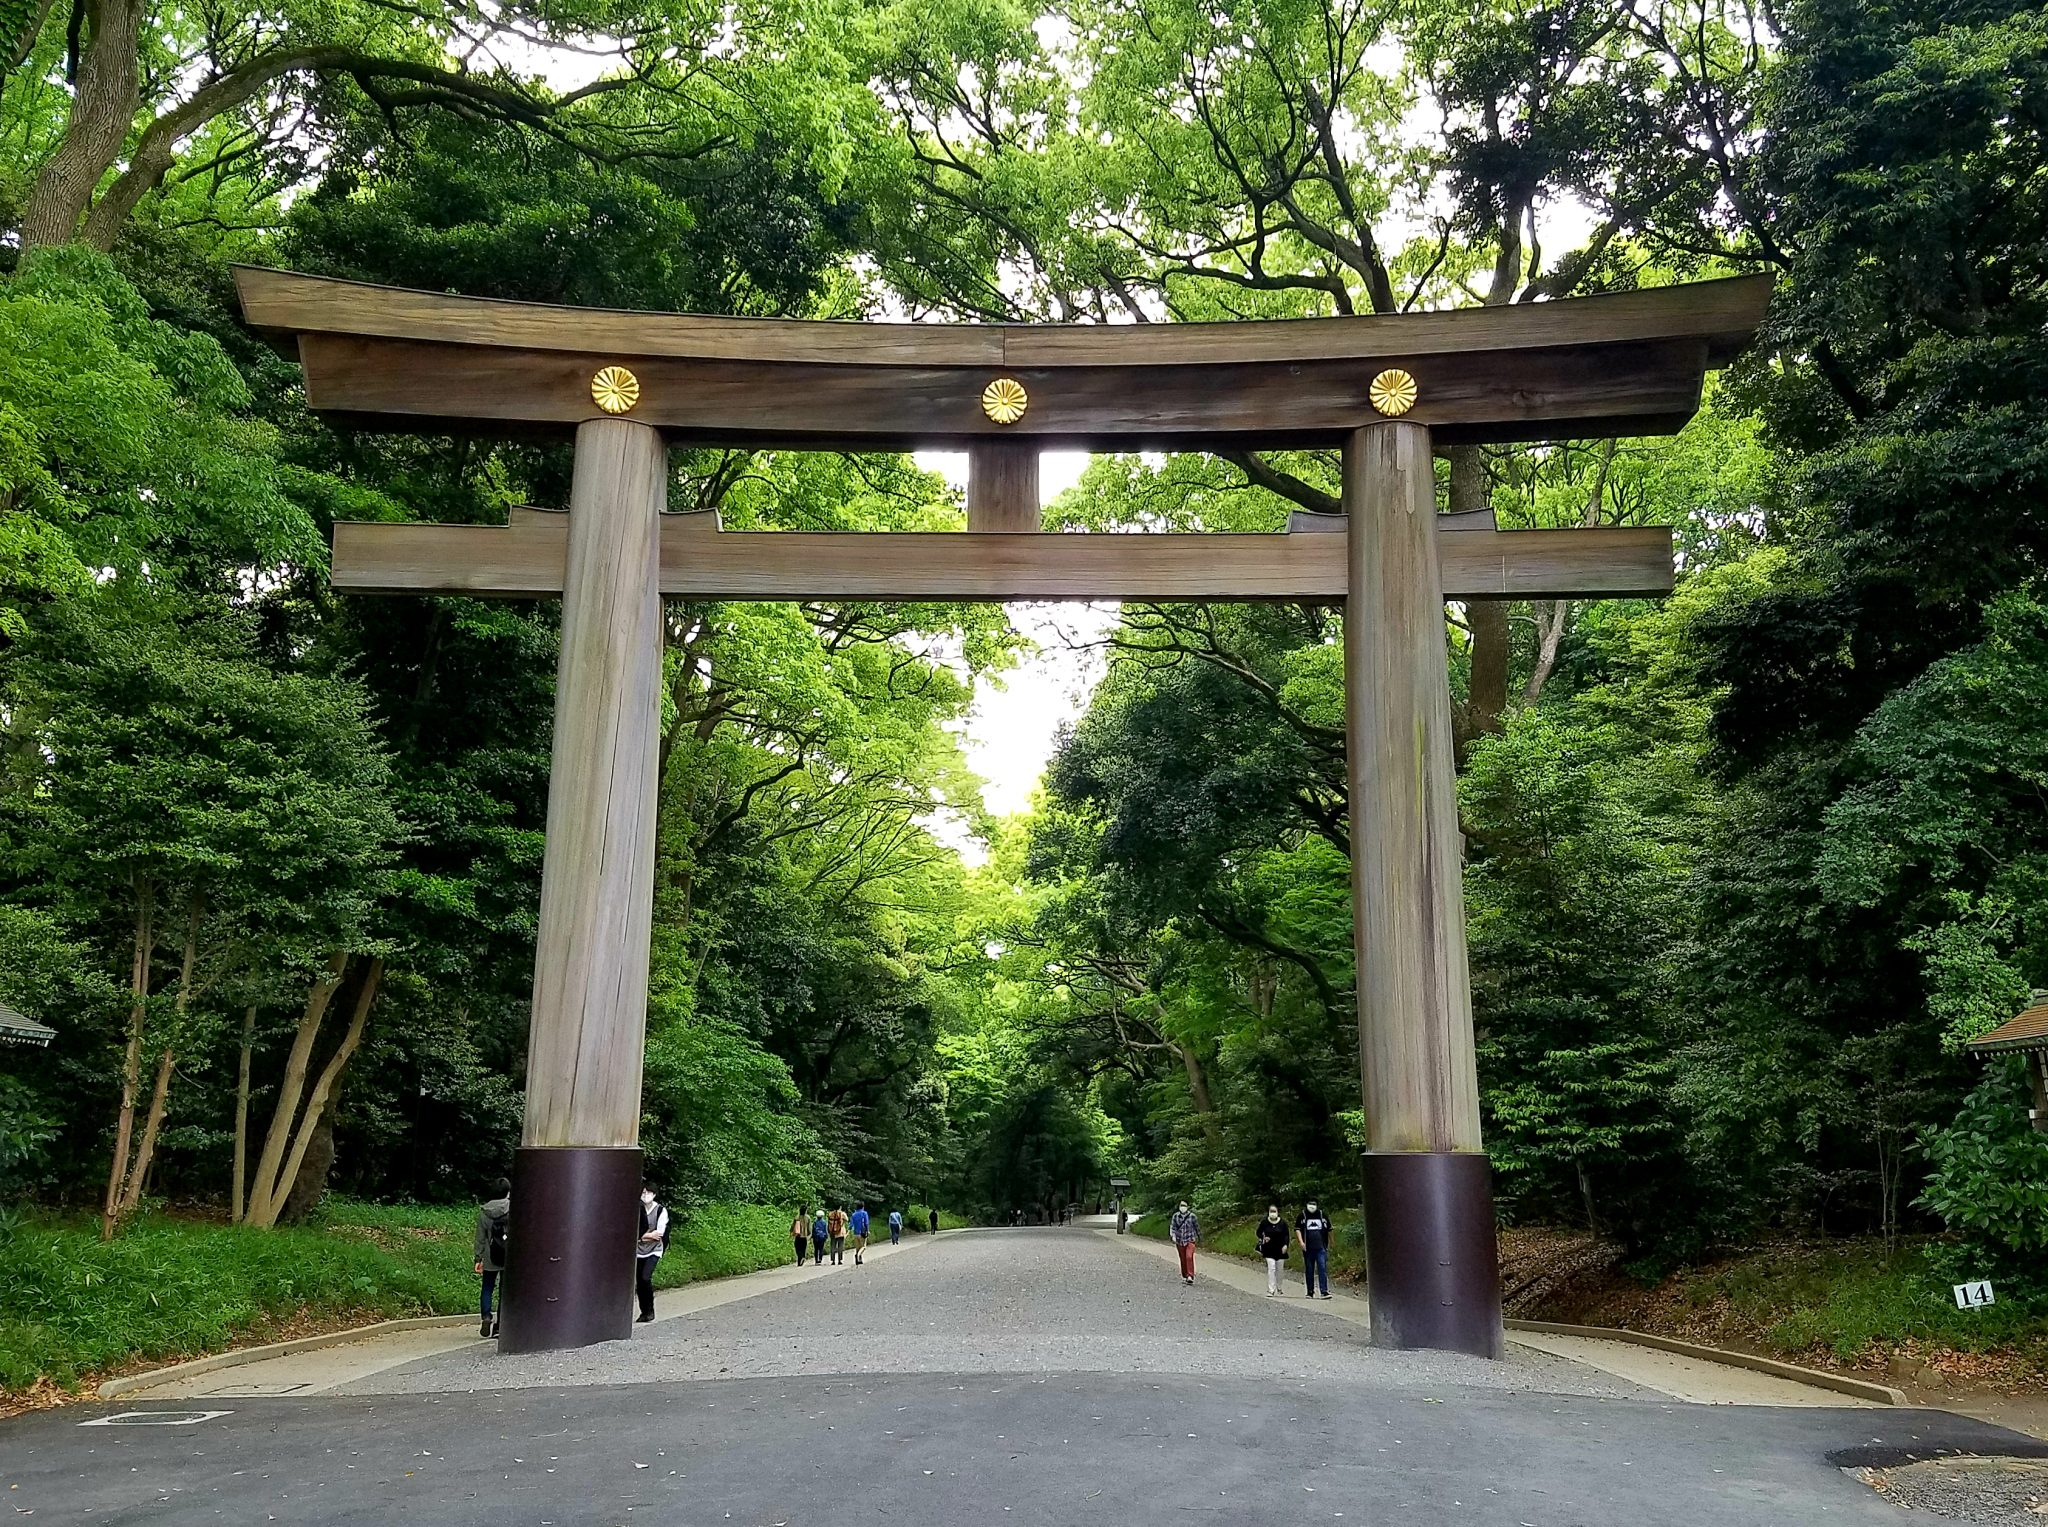 Meiji Jingu Torii Shrine Gate empty due to novel coronavirus COVID-19 on Saturday 9 May 2020